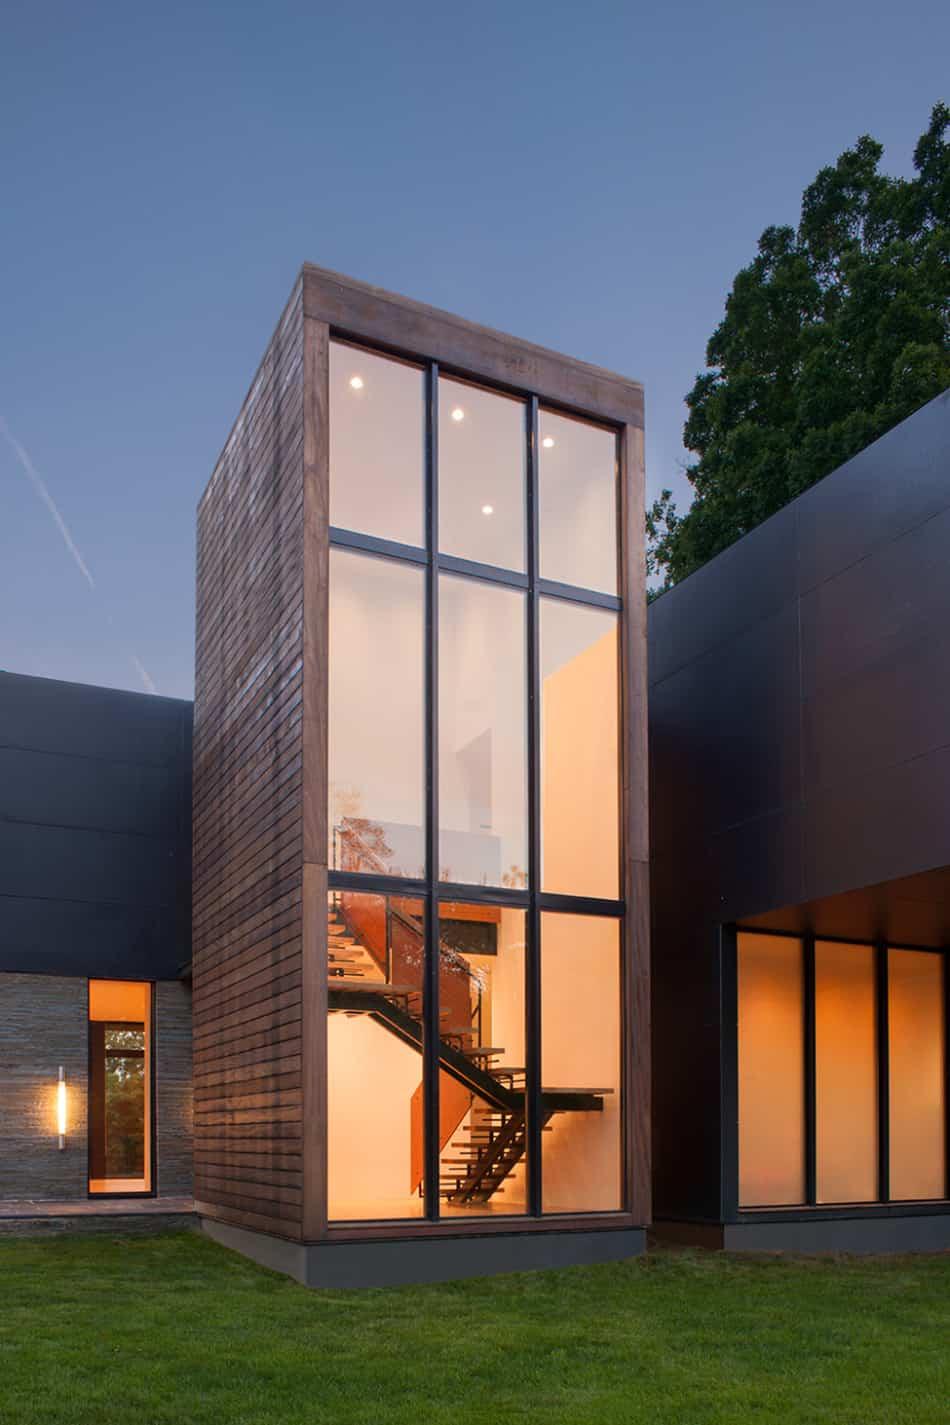 Modern Box House with Interior Glass Bridges | Modern ... on Modern Glass House Design  id=42817